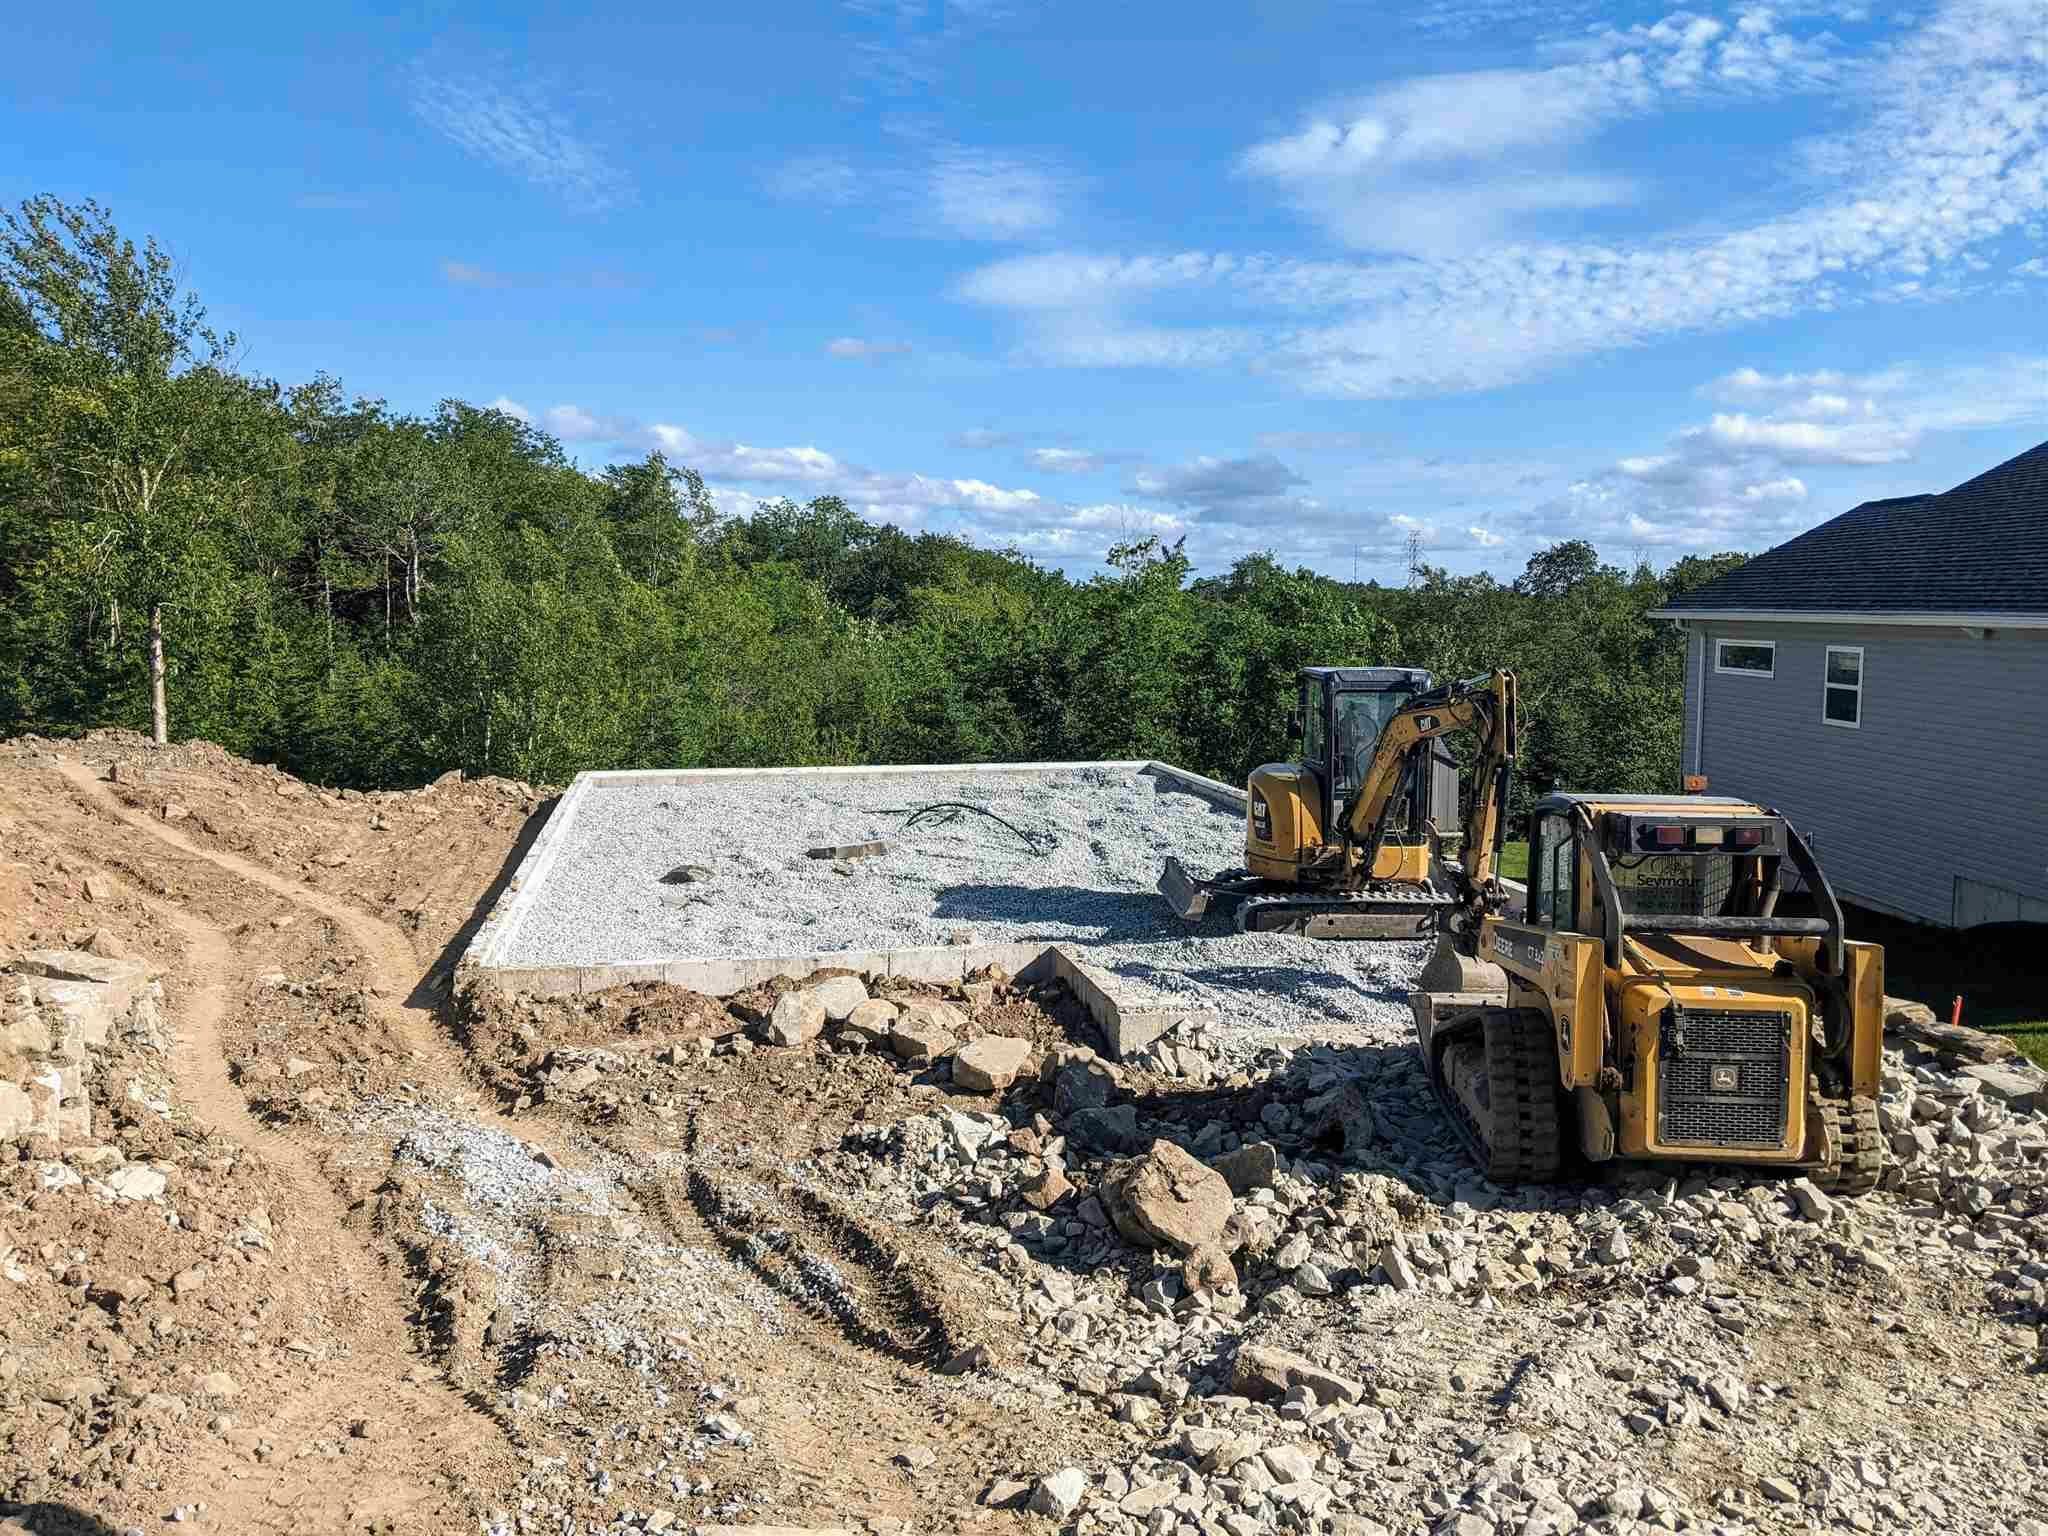 Main Photo: Unit 6 20 Buttercup Grove in Upper Sackville: 26-Beaverbank, Upper Sackville Residential for sale (Halifax-Dartmouth)  : MLS®# 202103331